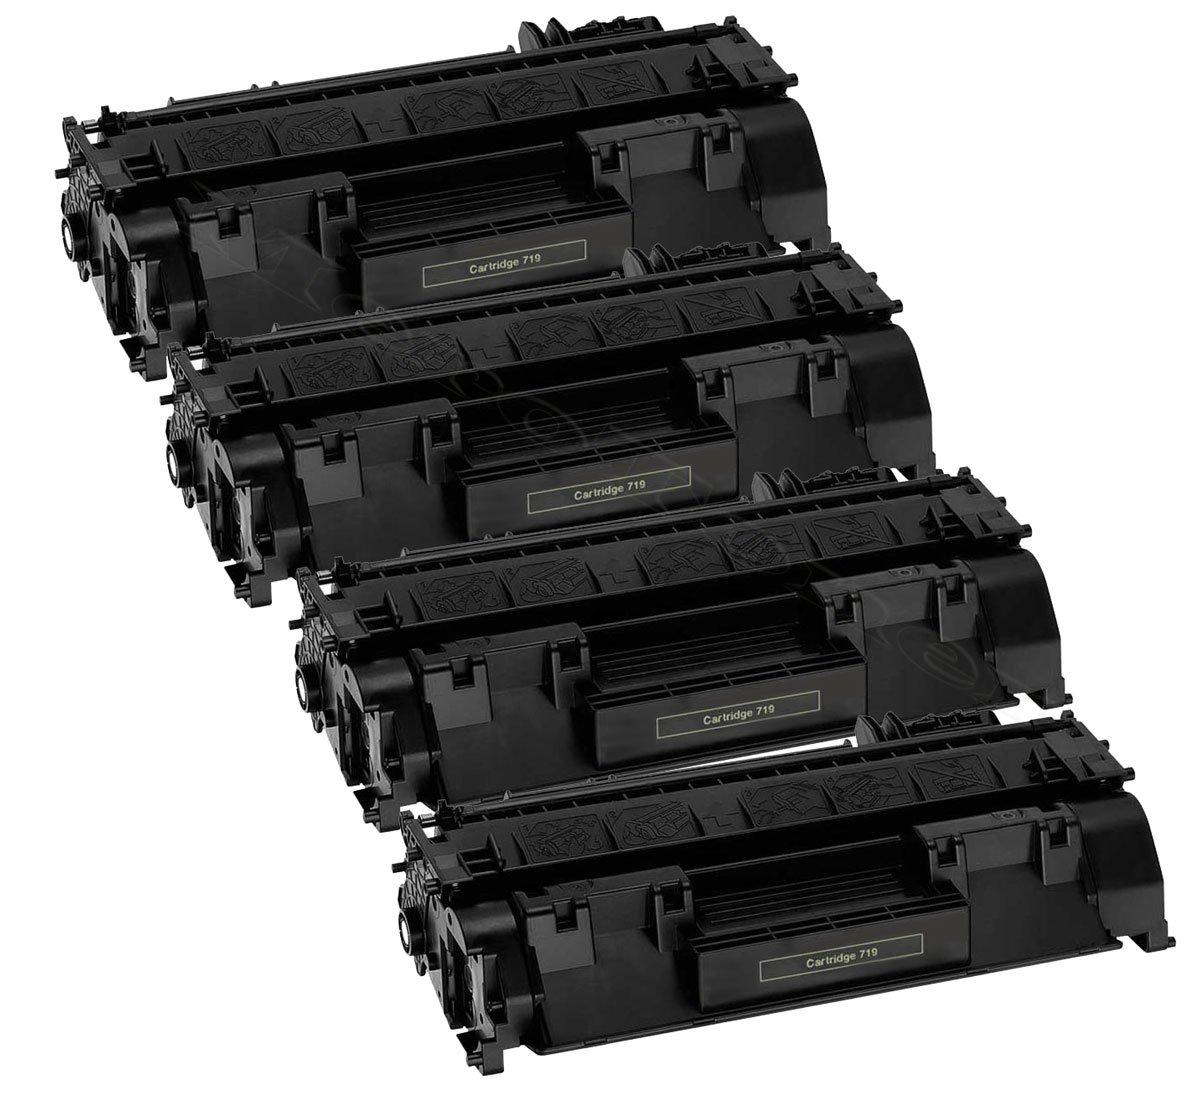 4er Pack Toner patrone Kompatibel zu Canon I Sensys LBP 6300 LBP 6650 LBP 6670 CRG719H CRG 719H merotoner kein Canon Original crg-719